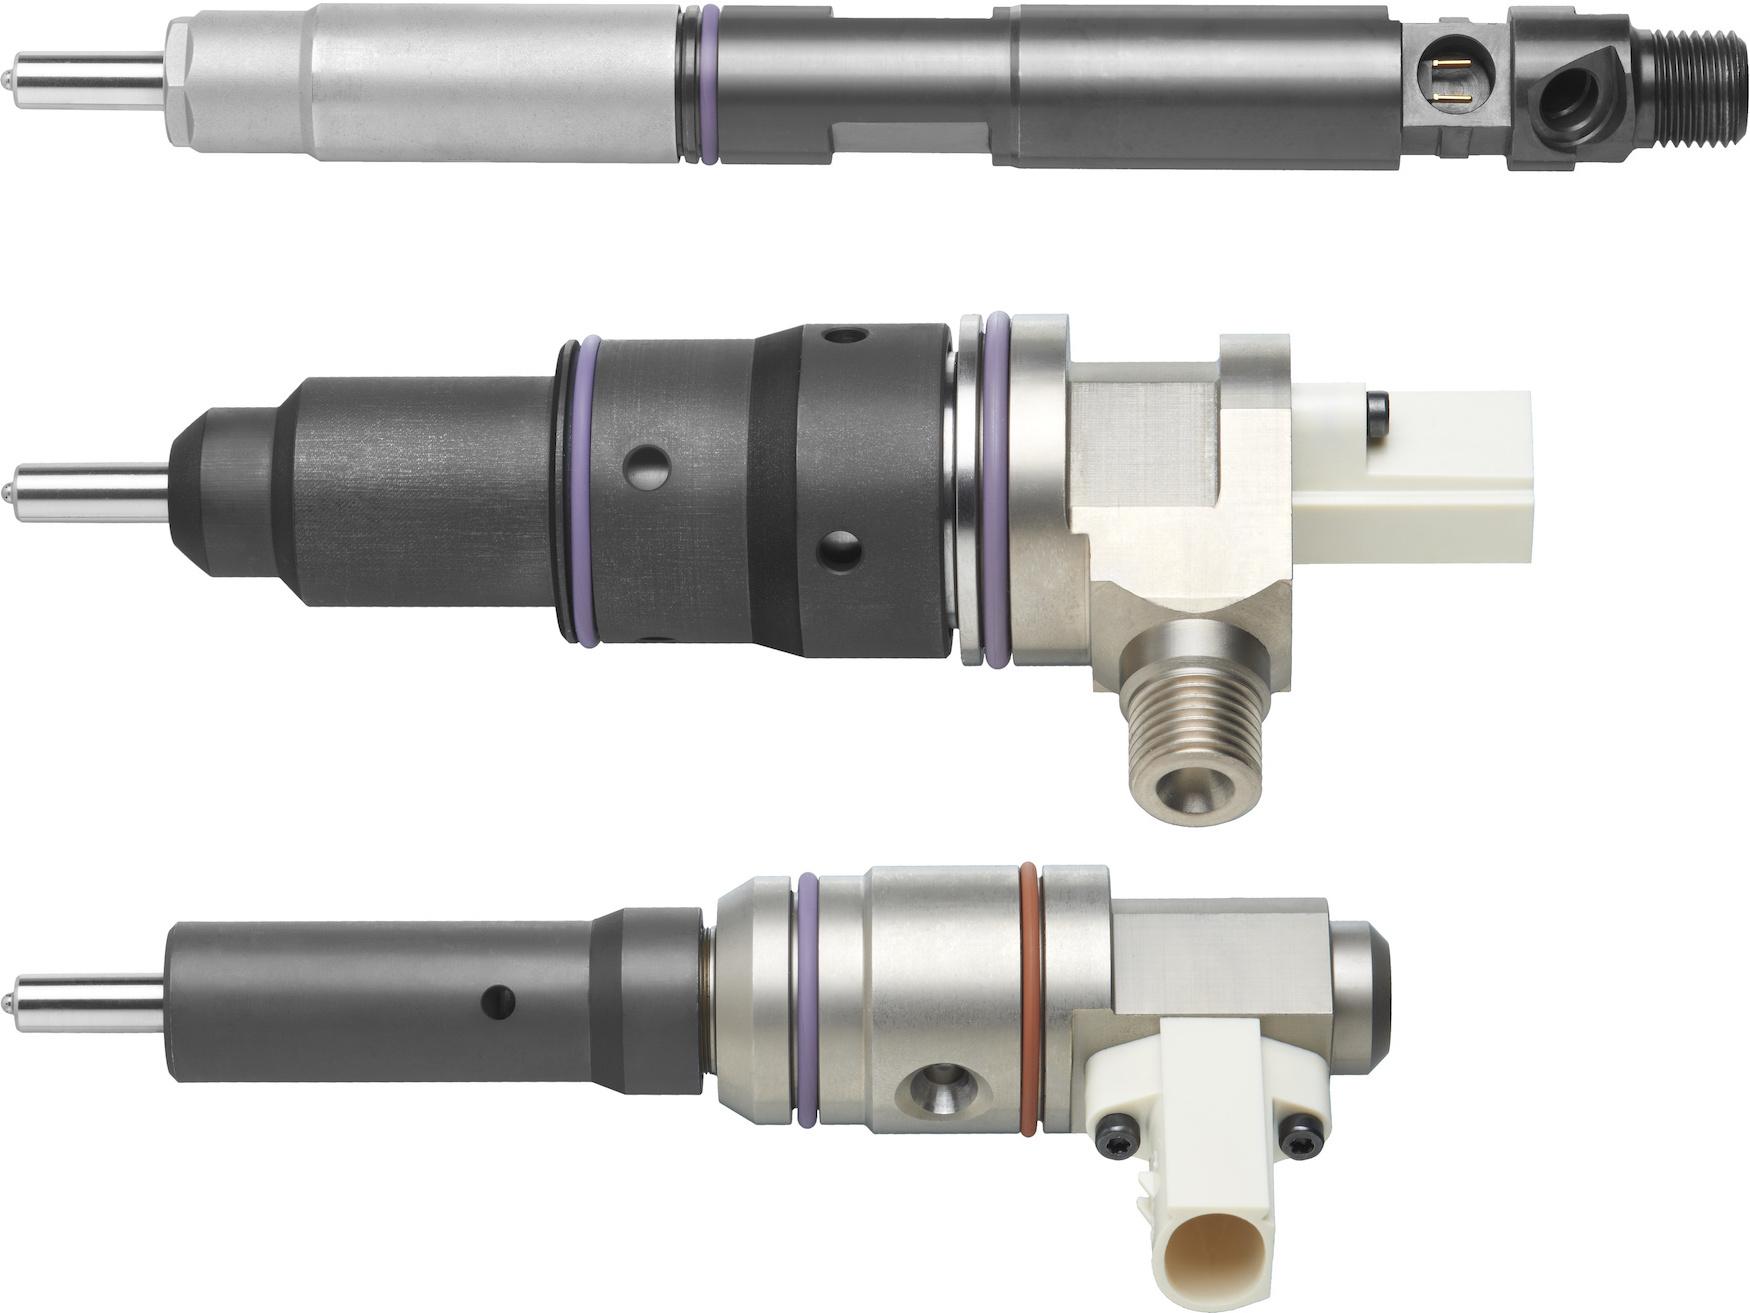 150429-4 DFI 21 Diesel Common Rail Injectors.tif